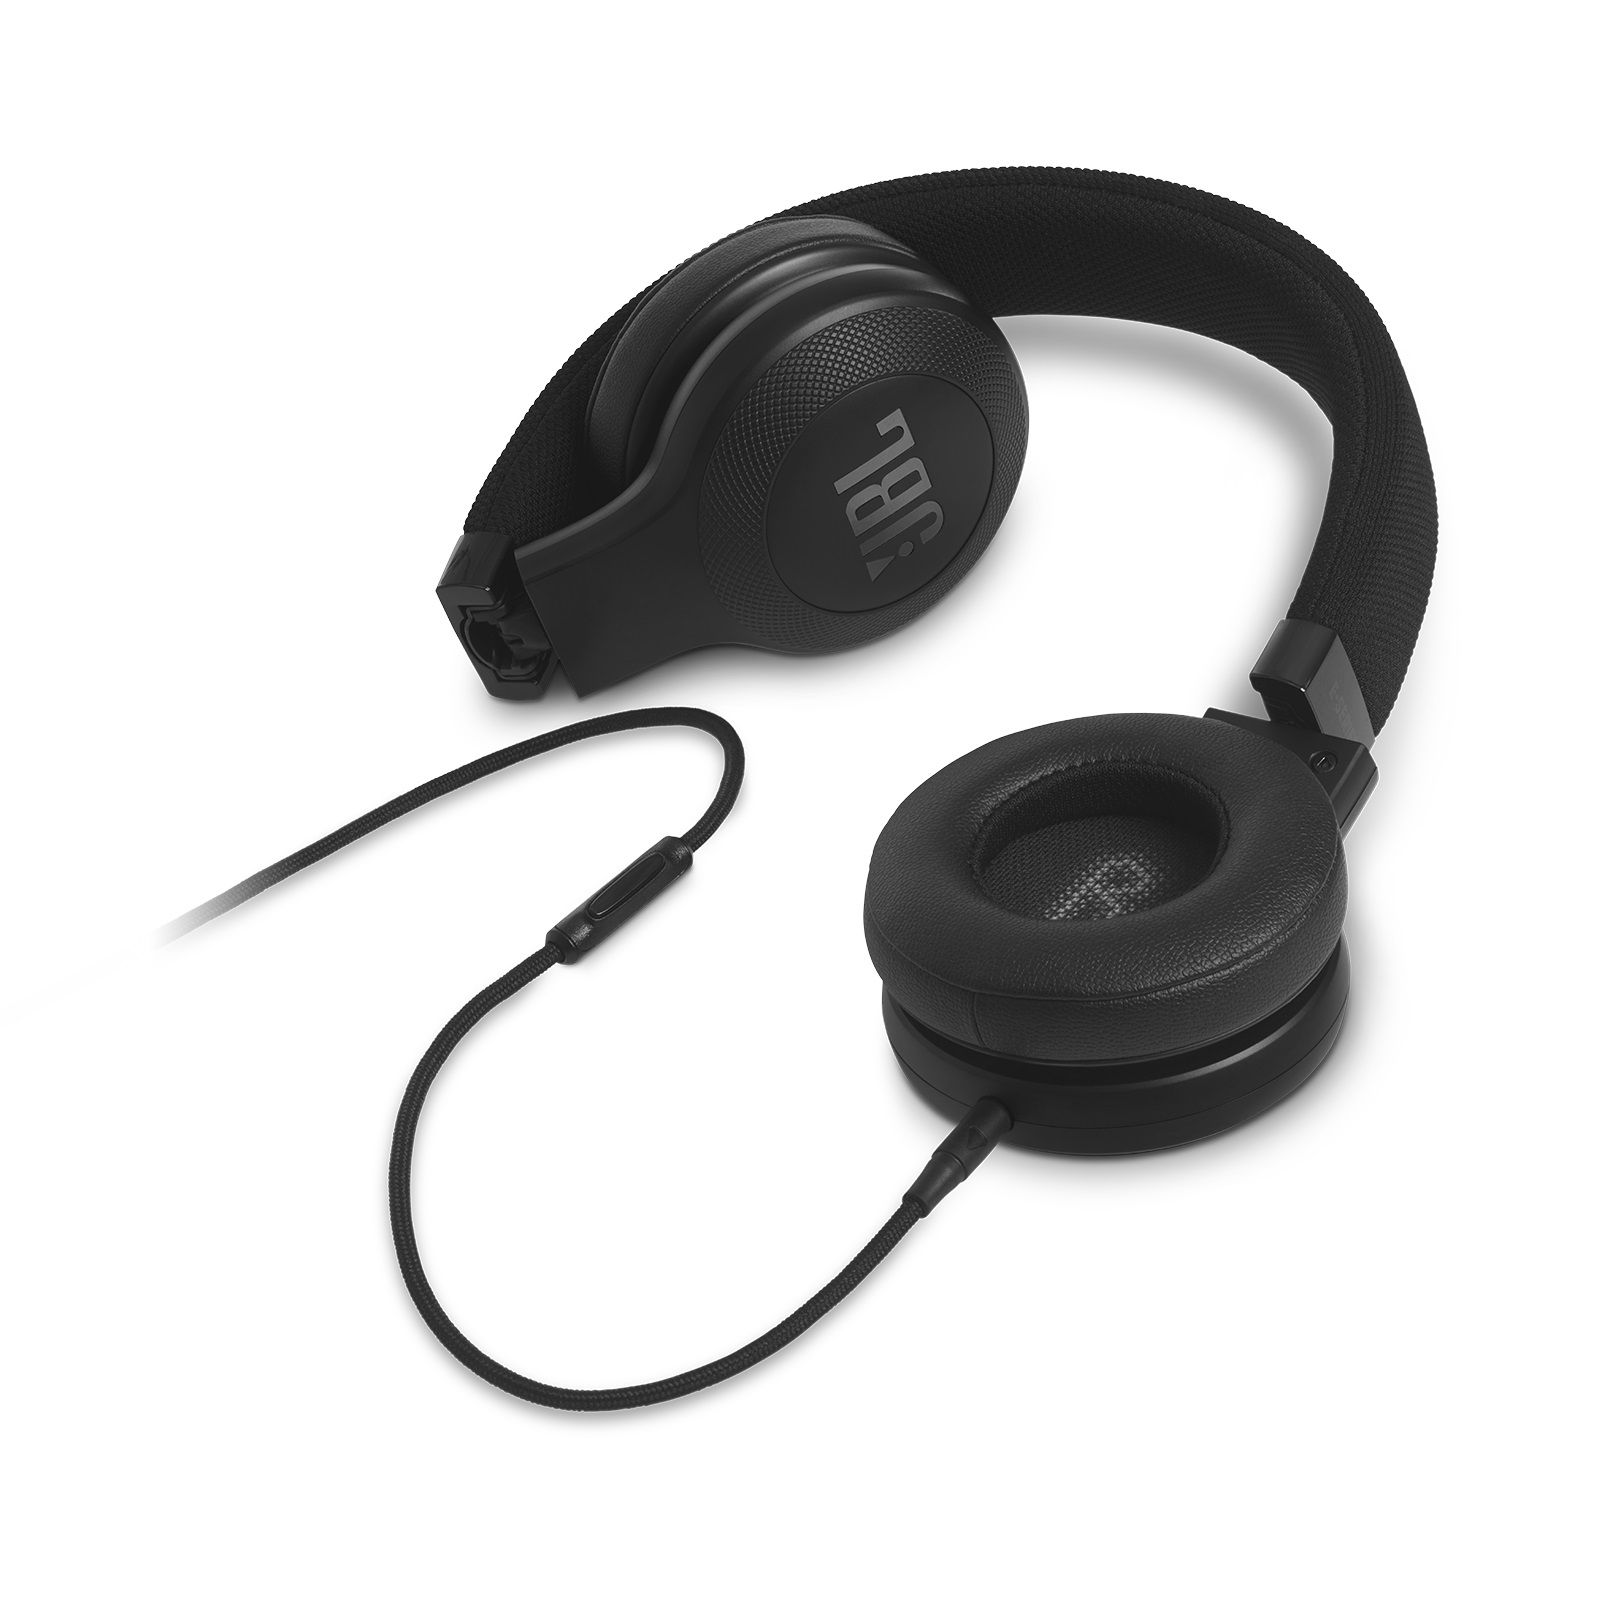 Fone De Ouvido Jbl E35 Blk One Ear